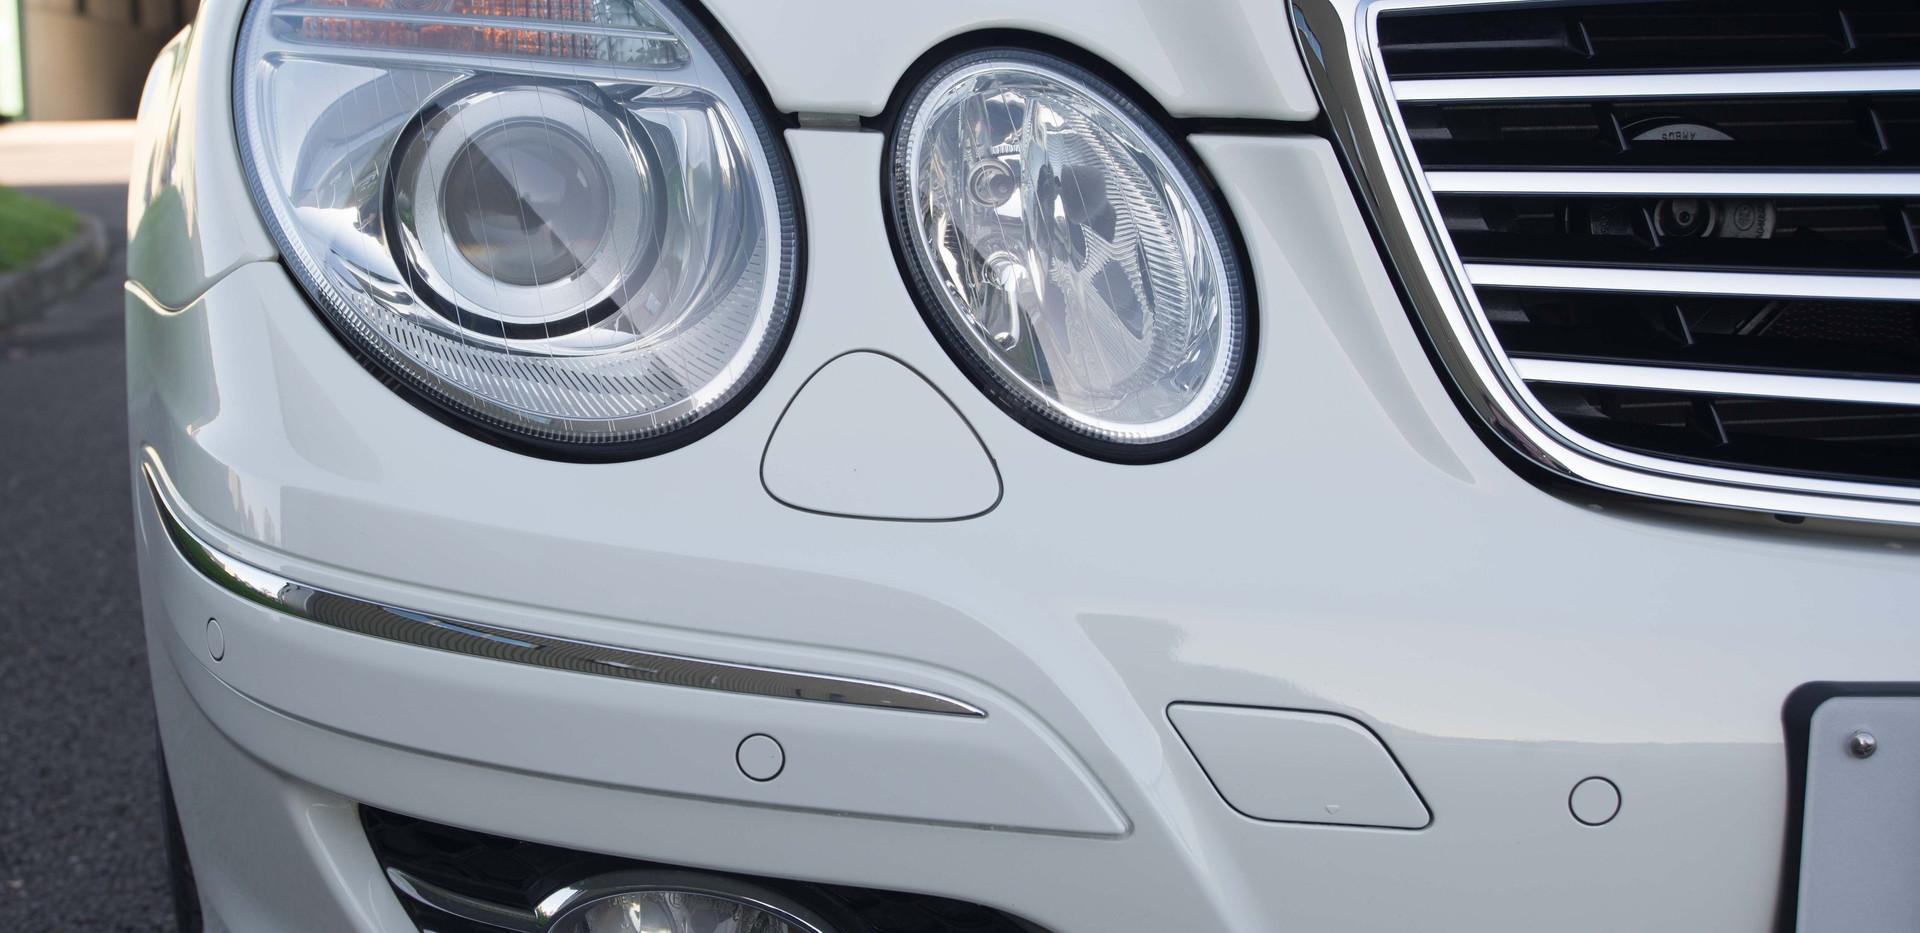 Mercedes E350 For Sale UK London  (25 of